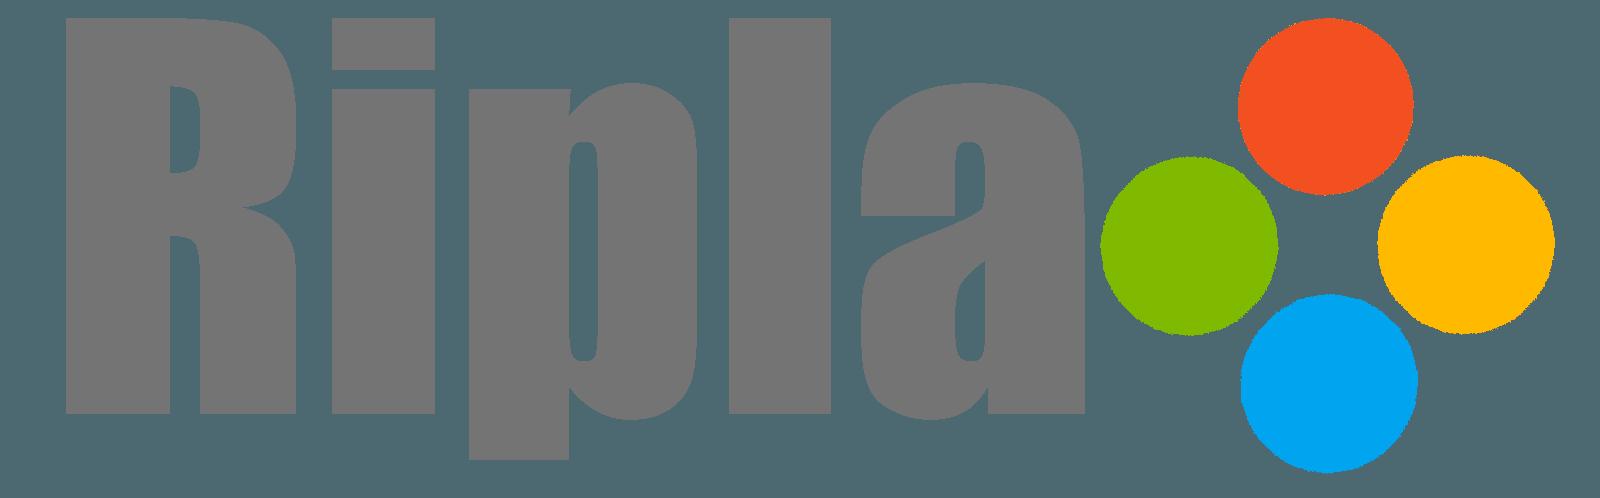 Ripla - Northallerton Web Design | Hosting | I.T Support